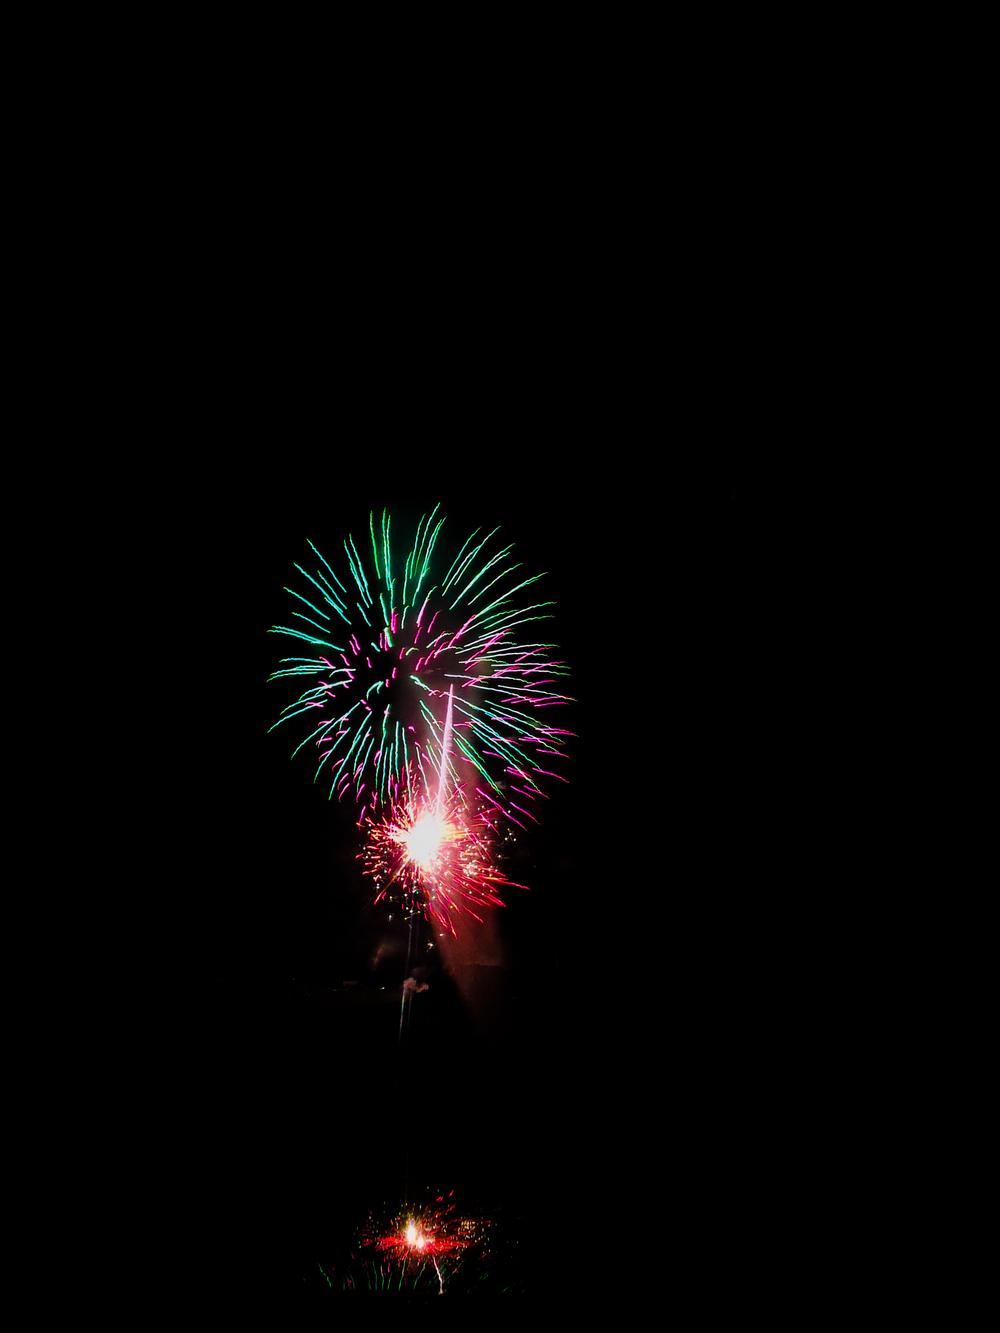 shaunavon-fireworks-light-up-the-night-sky.jpg